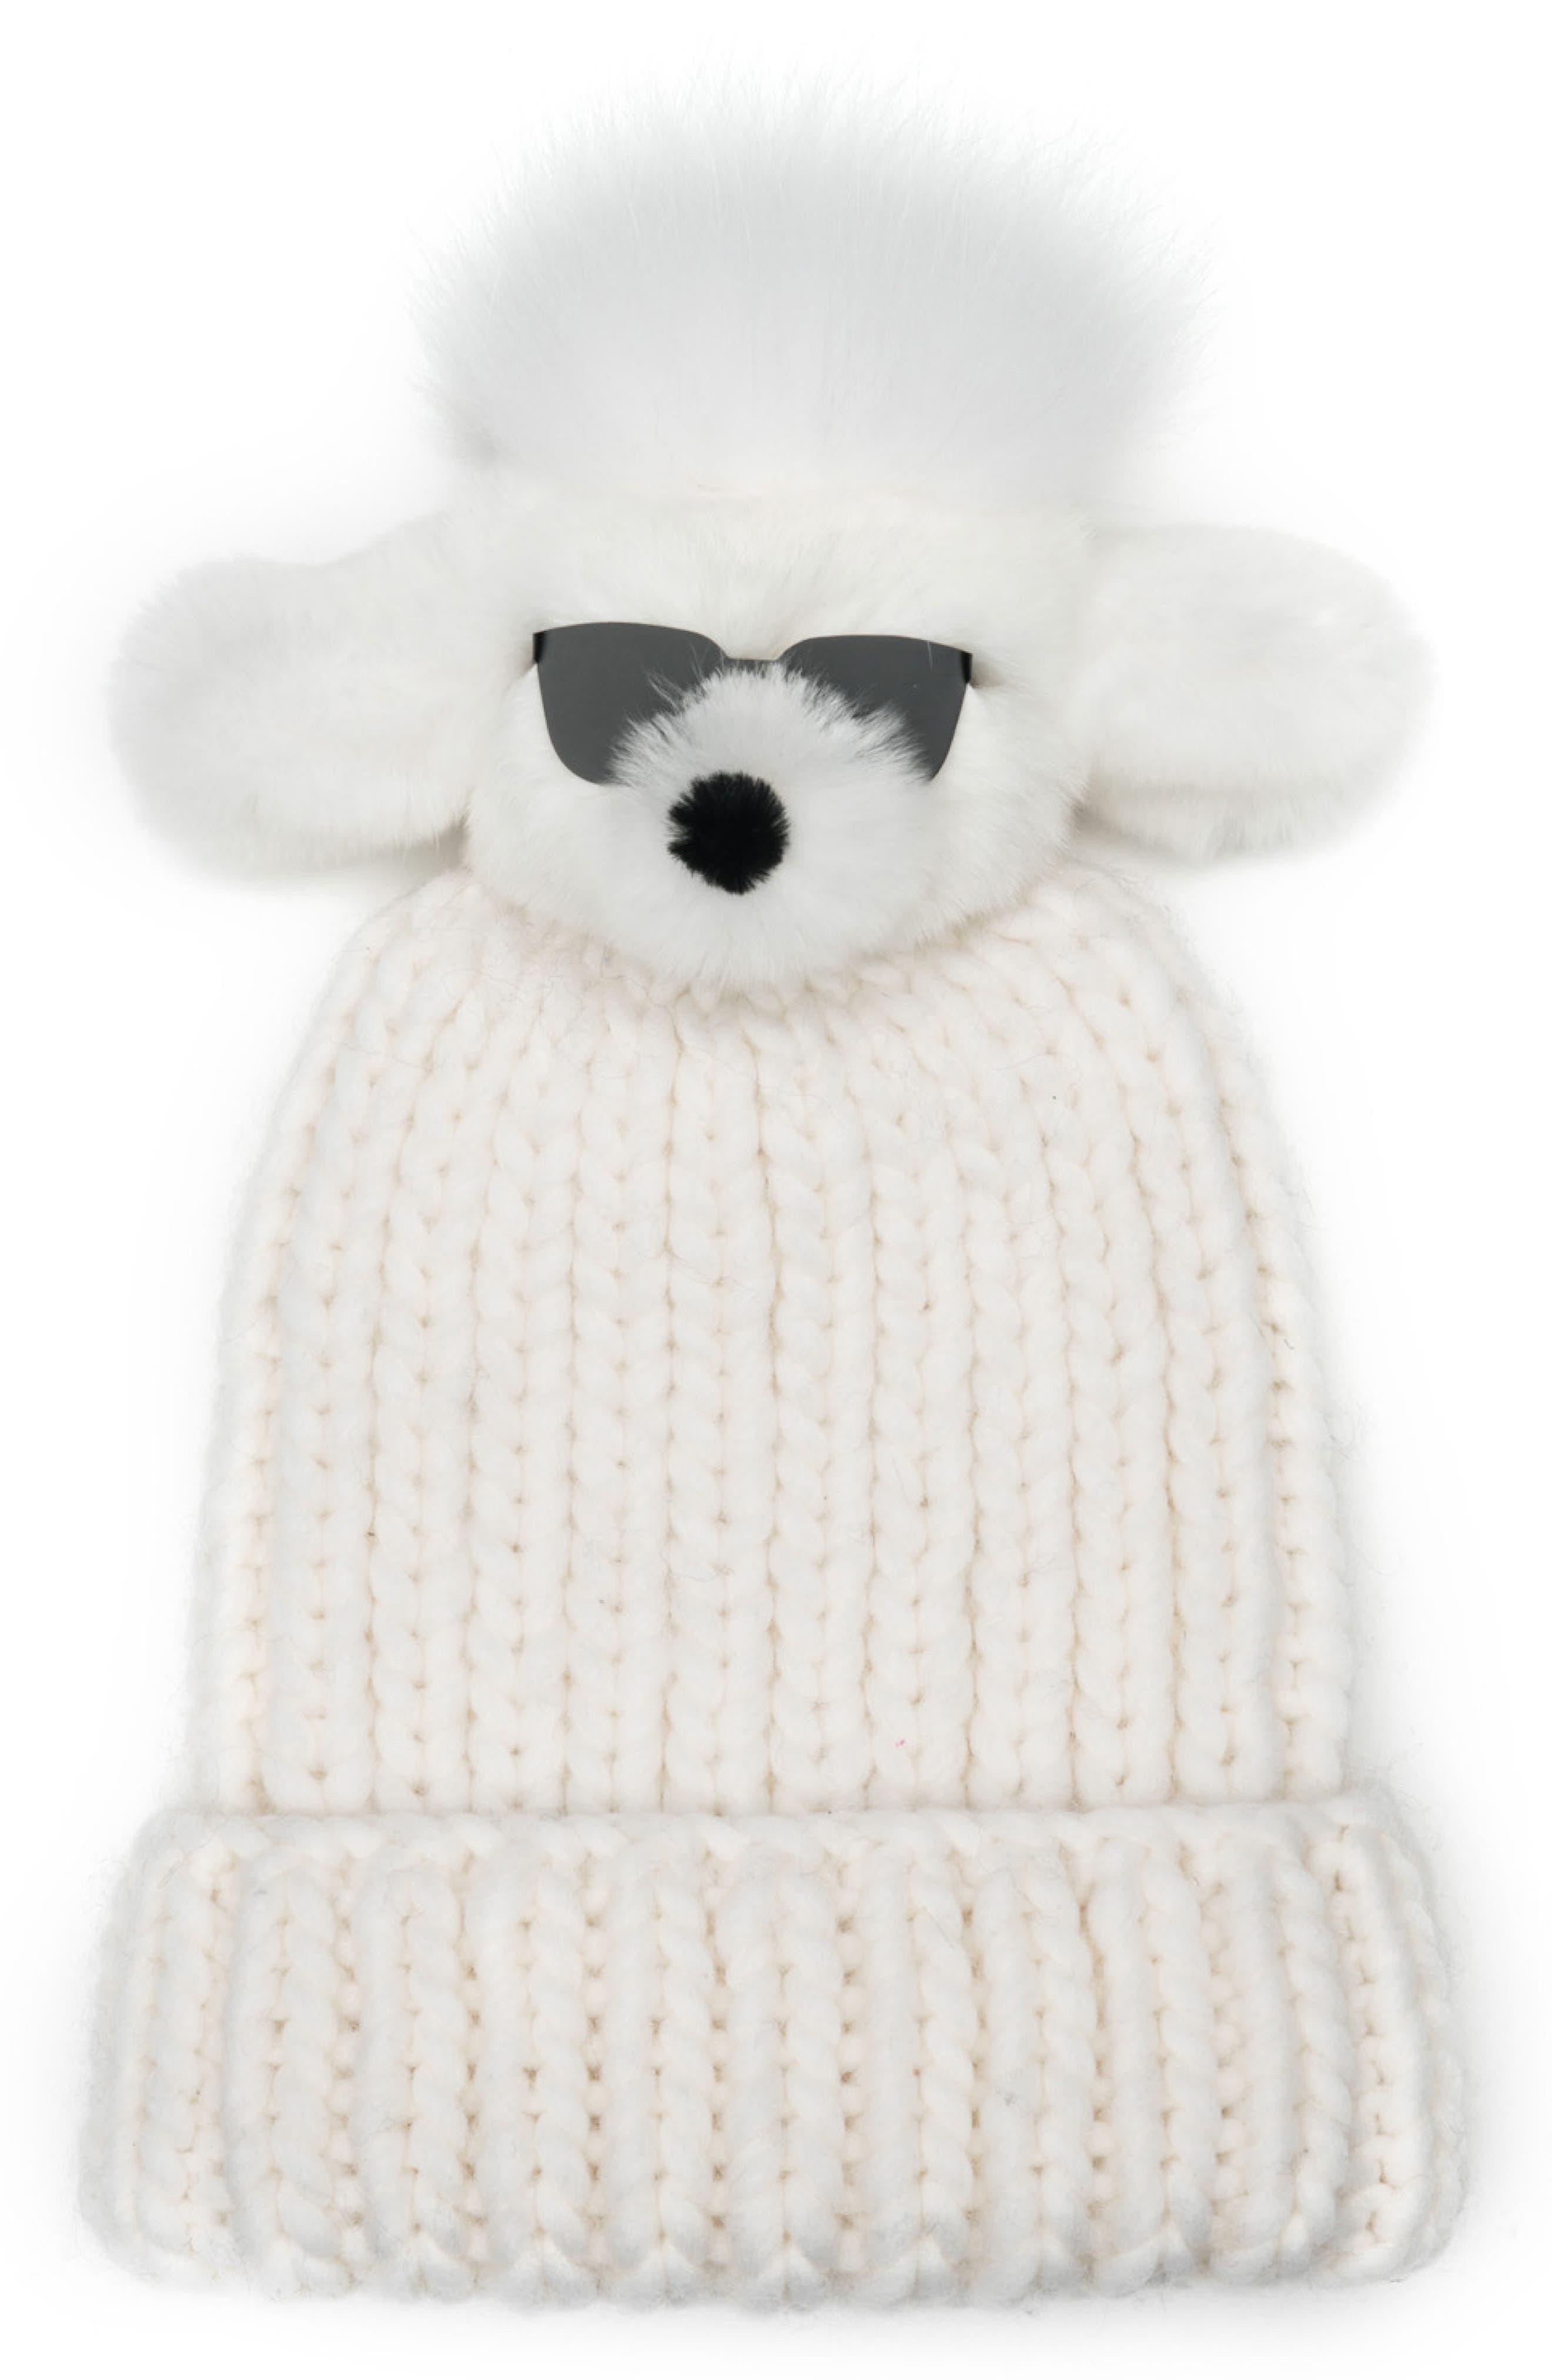 Rain Wool Stocking Cap with Genuine Fox Fur Pom,                             Main thumbnail 2, color,